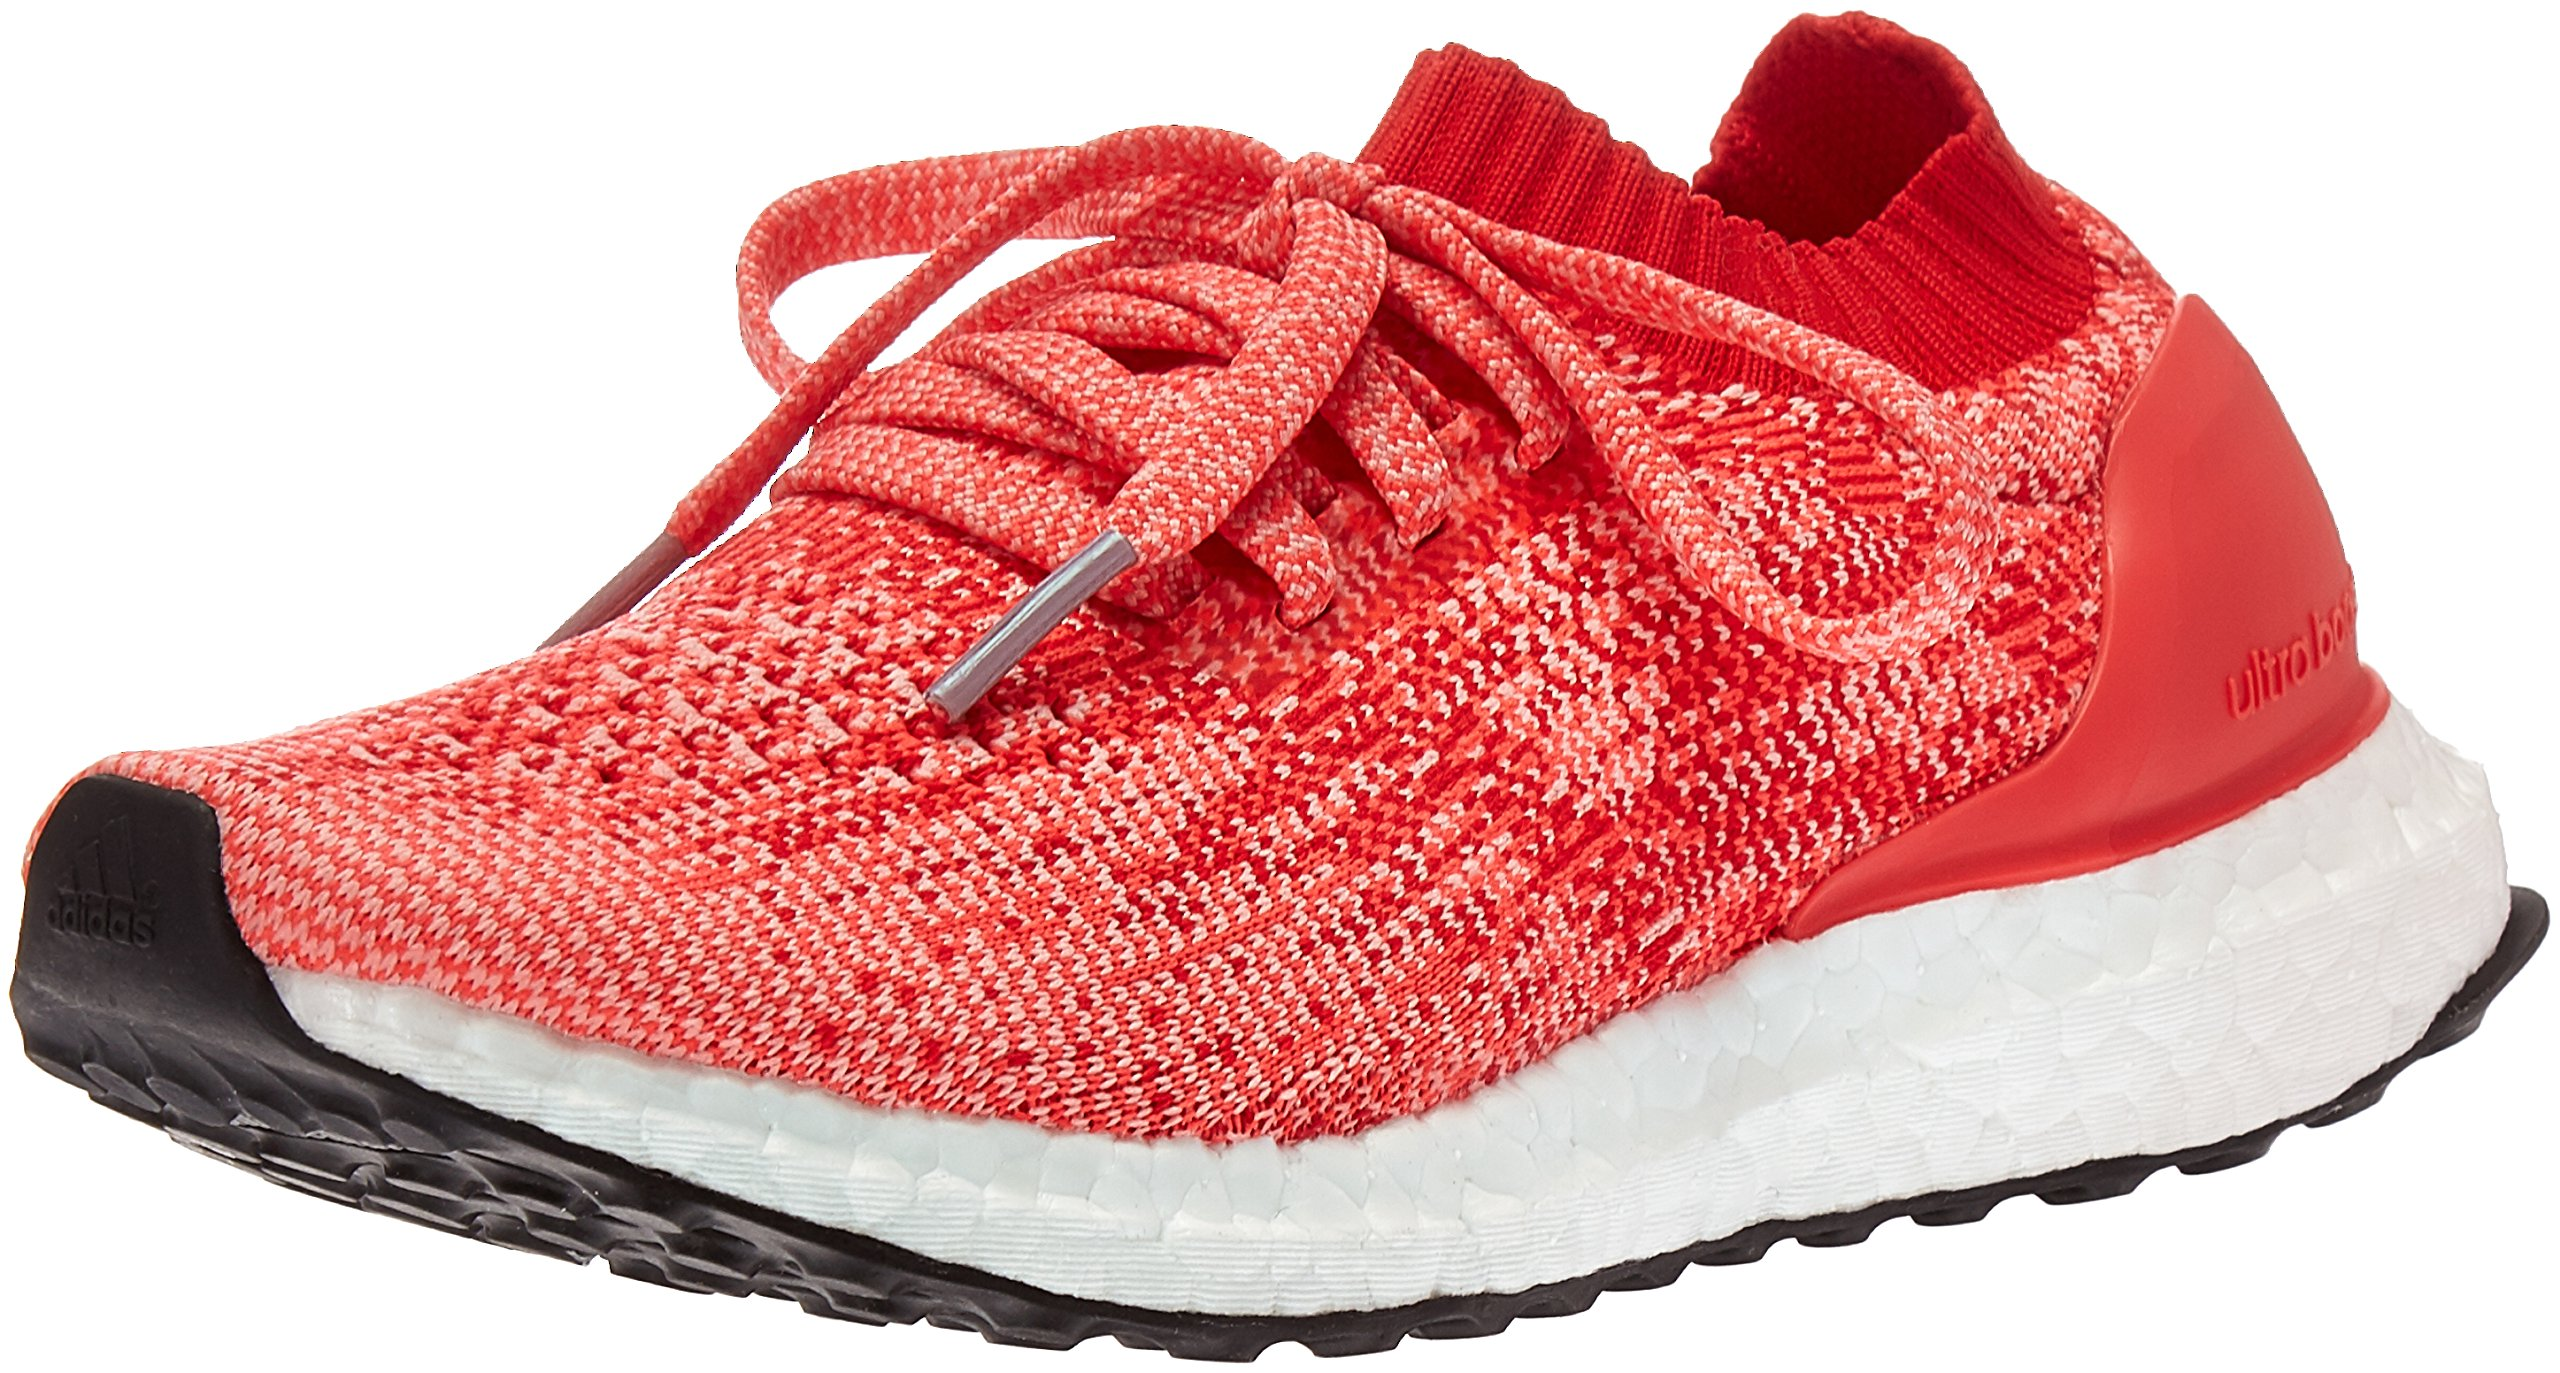 27cbcb32864 ... kids cheap  really comfortable 79c20 c0d0e Galleon - Adidas Girls Ultraboost  Uncaged J Running Shoe